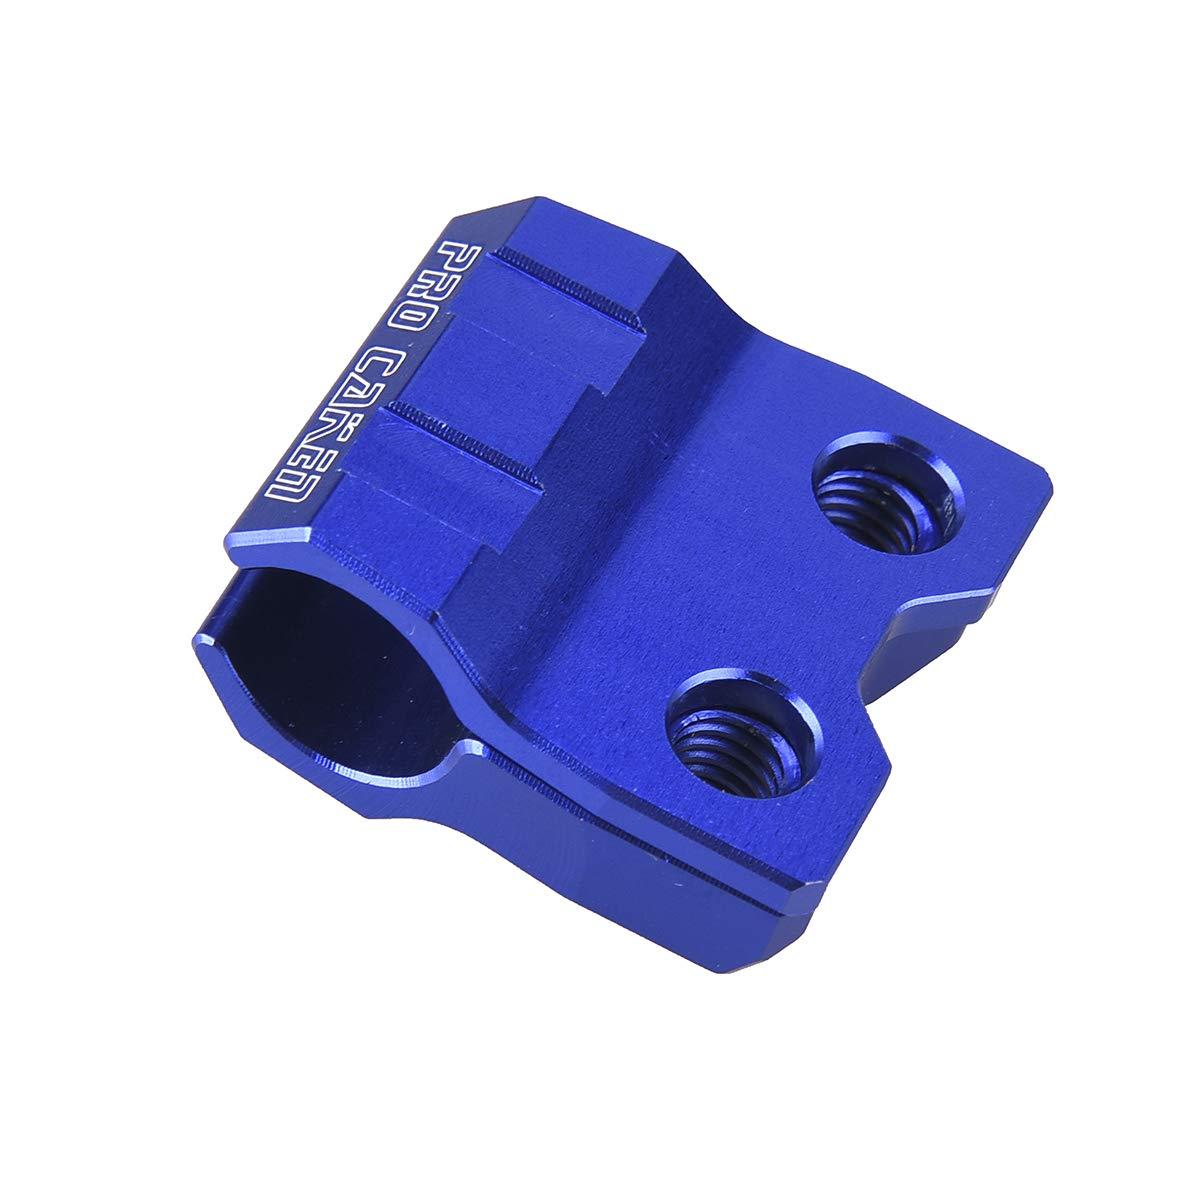 Pro Carken CNC Bremsschlauchklemme Halter fü r YZ125 YZ250 YZF250 YZF450 YZ250X YZ250FX YZ450FX WR125 WR250 WRF250 WRF450 DirtBikeHome